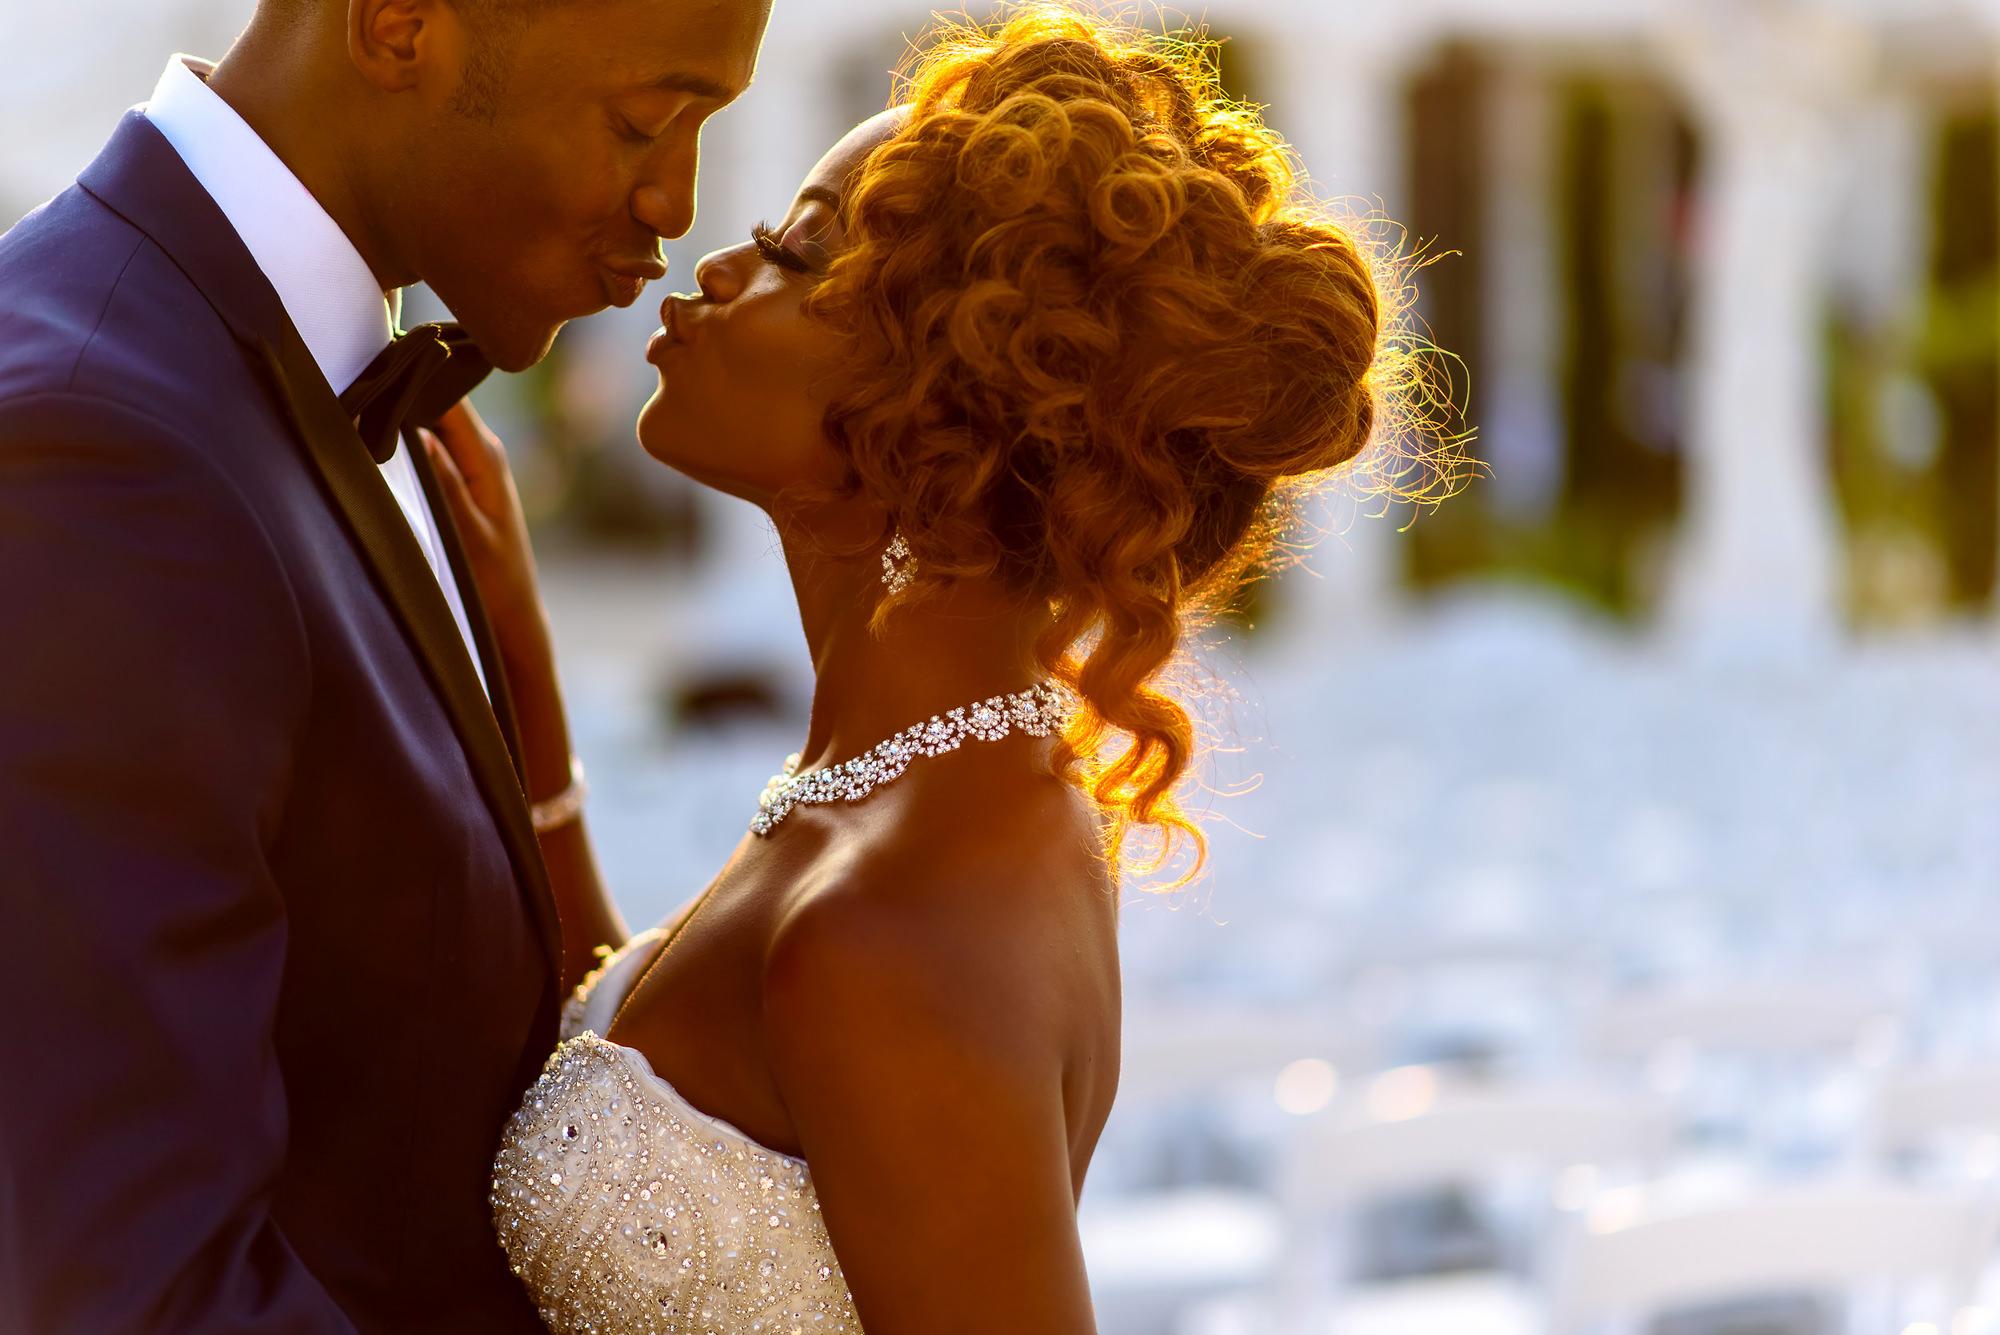 groom-bride-with-red-hair-beaded-dress-and-large-diamond-necklace-pucker-up-worlds-best-wedding-photos-jide-alakija-new-york-wedding-photographers